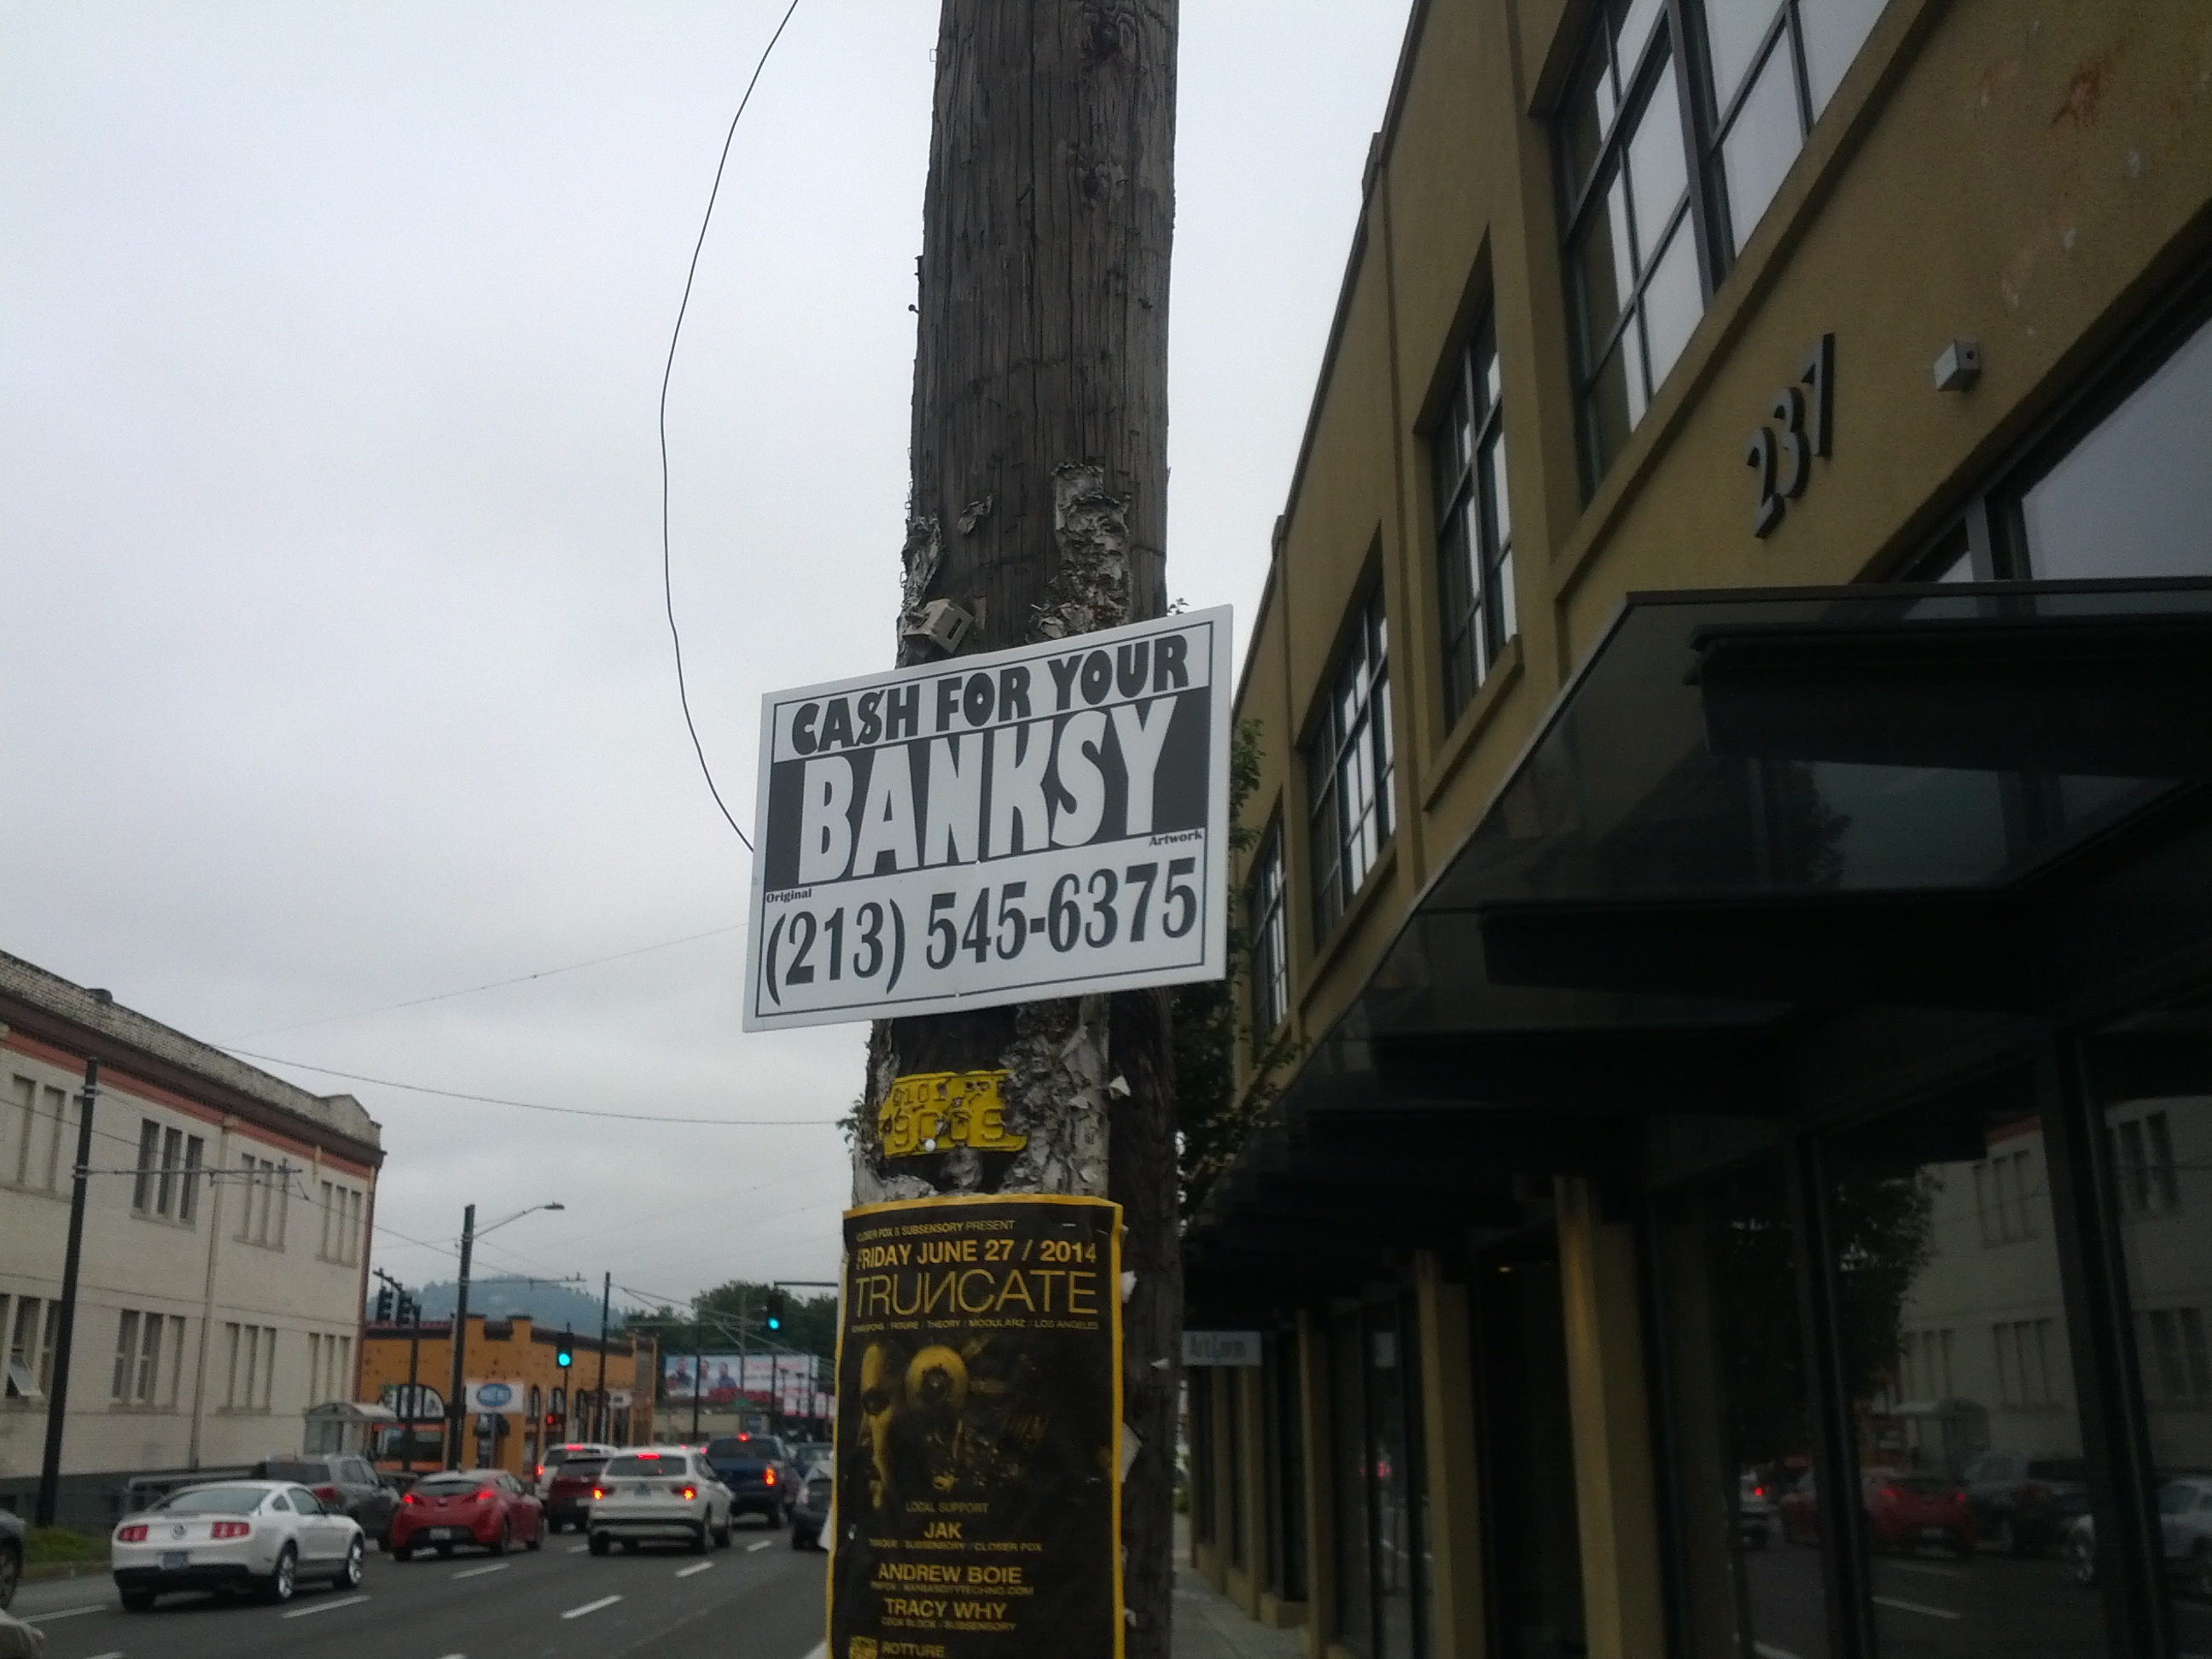 banksy_pole_01.jpg